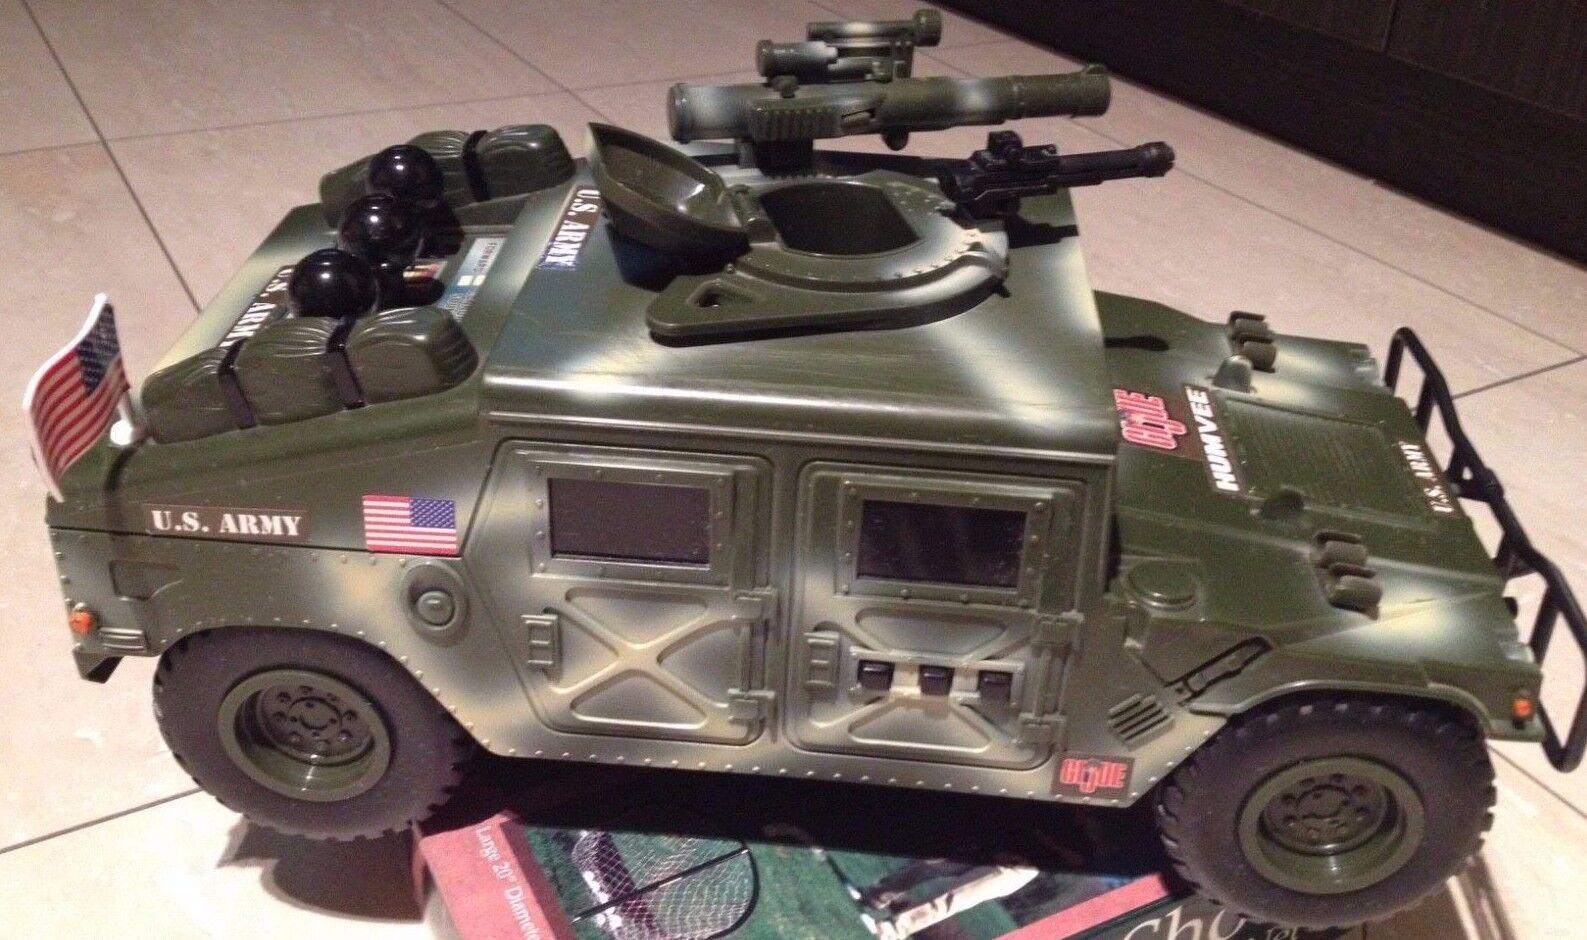 Gi Joe US Army  humvee    toys Military tank Vehicle Collectible rare big 15 inch e109ae